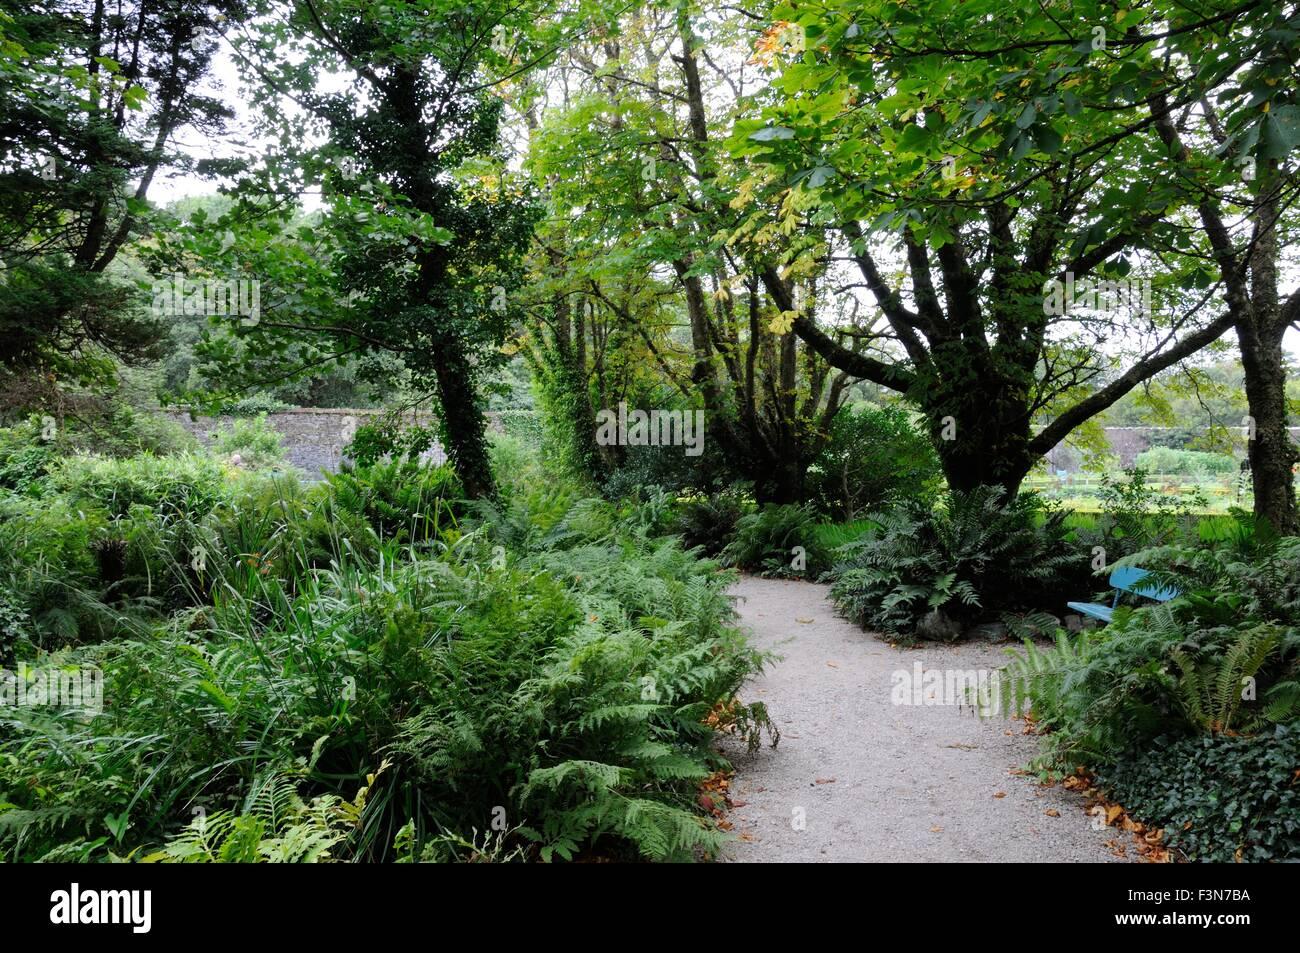 Viktorianische Farn Garten Spaziergang Am Kylemore Abbey Connemara